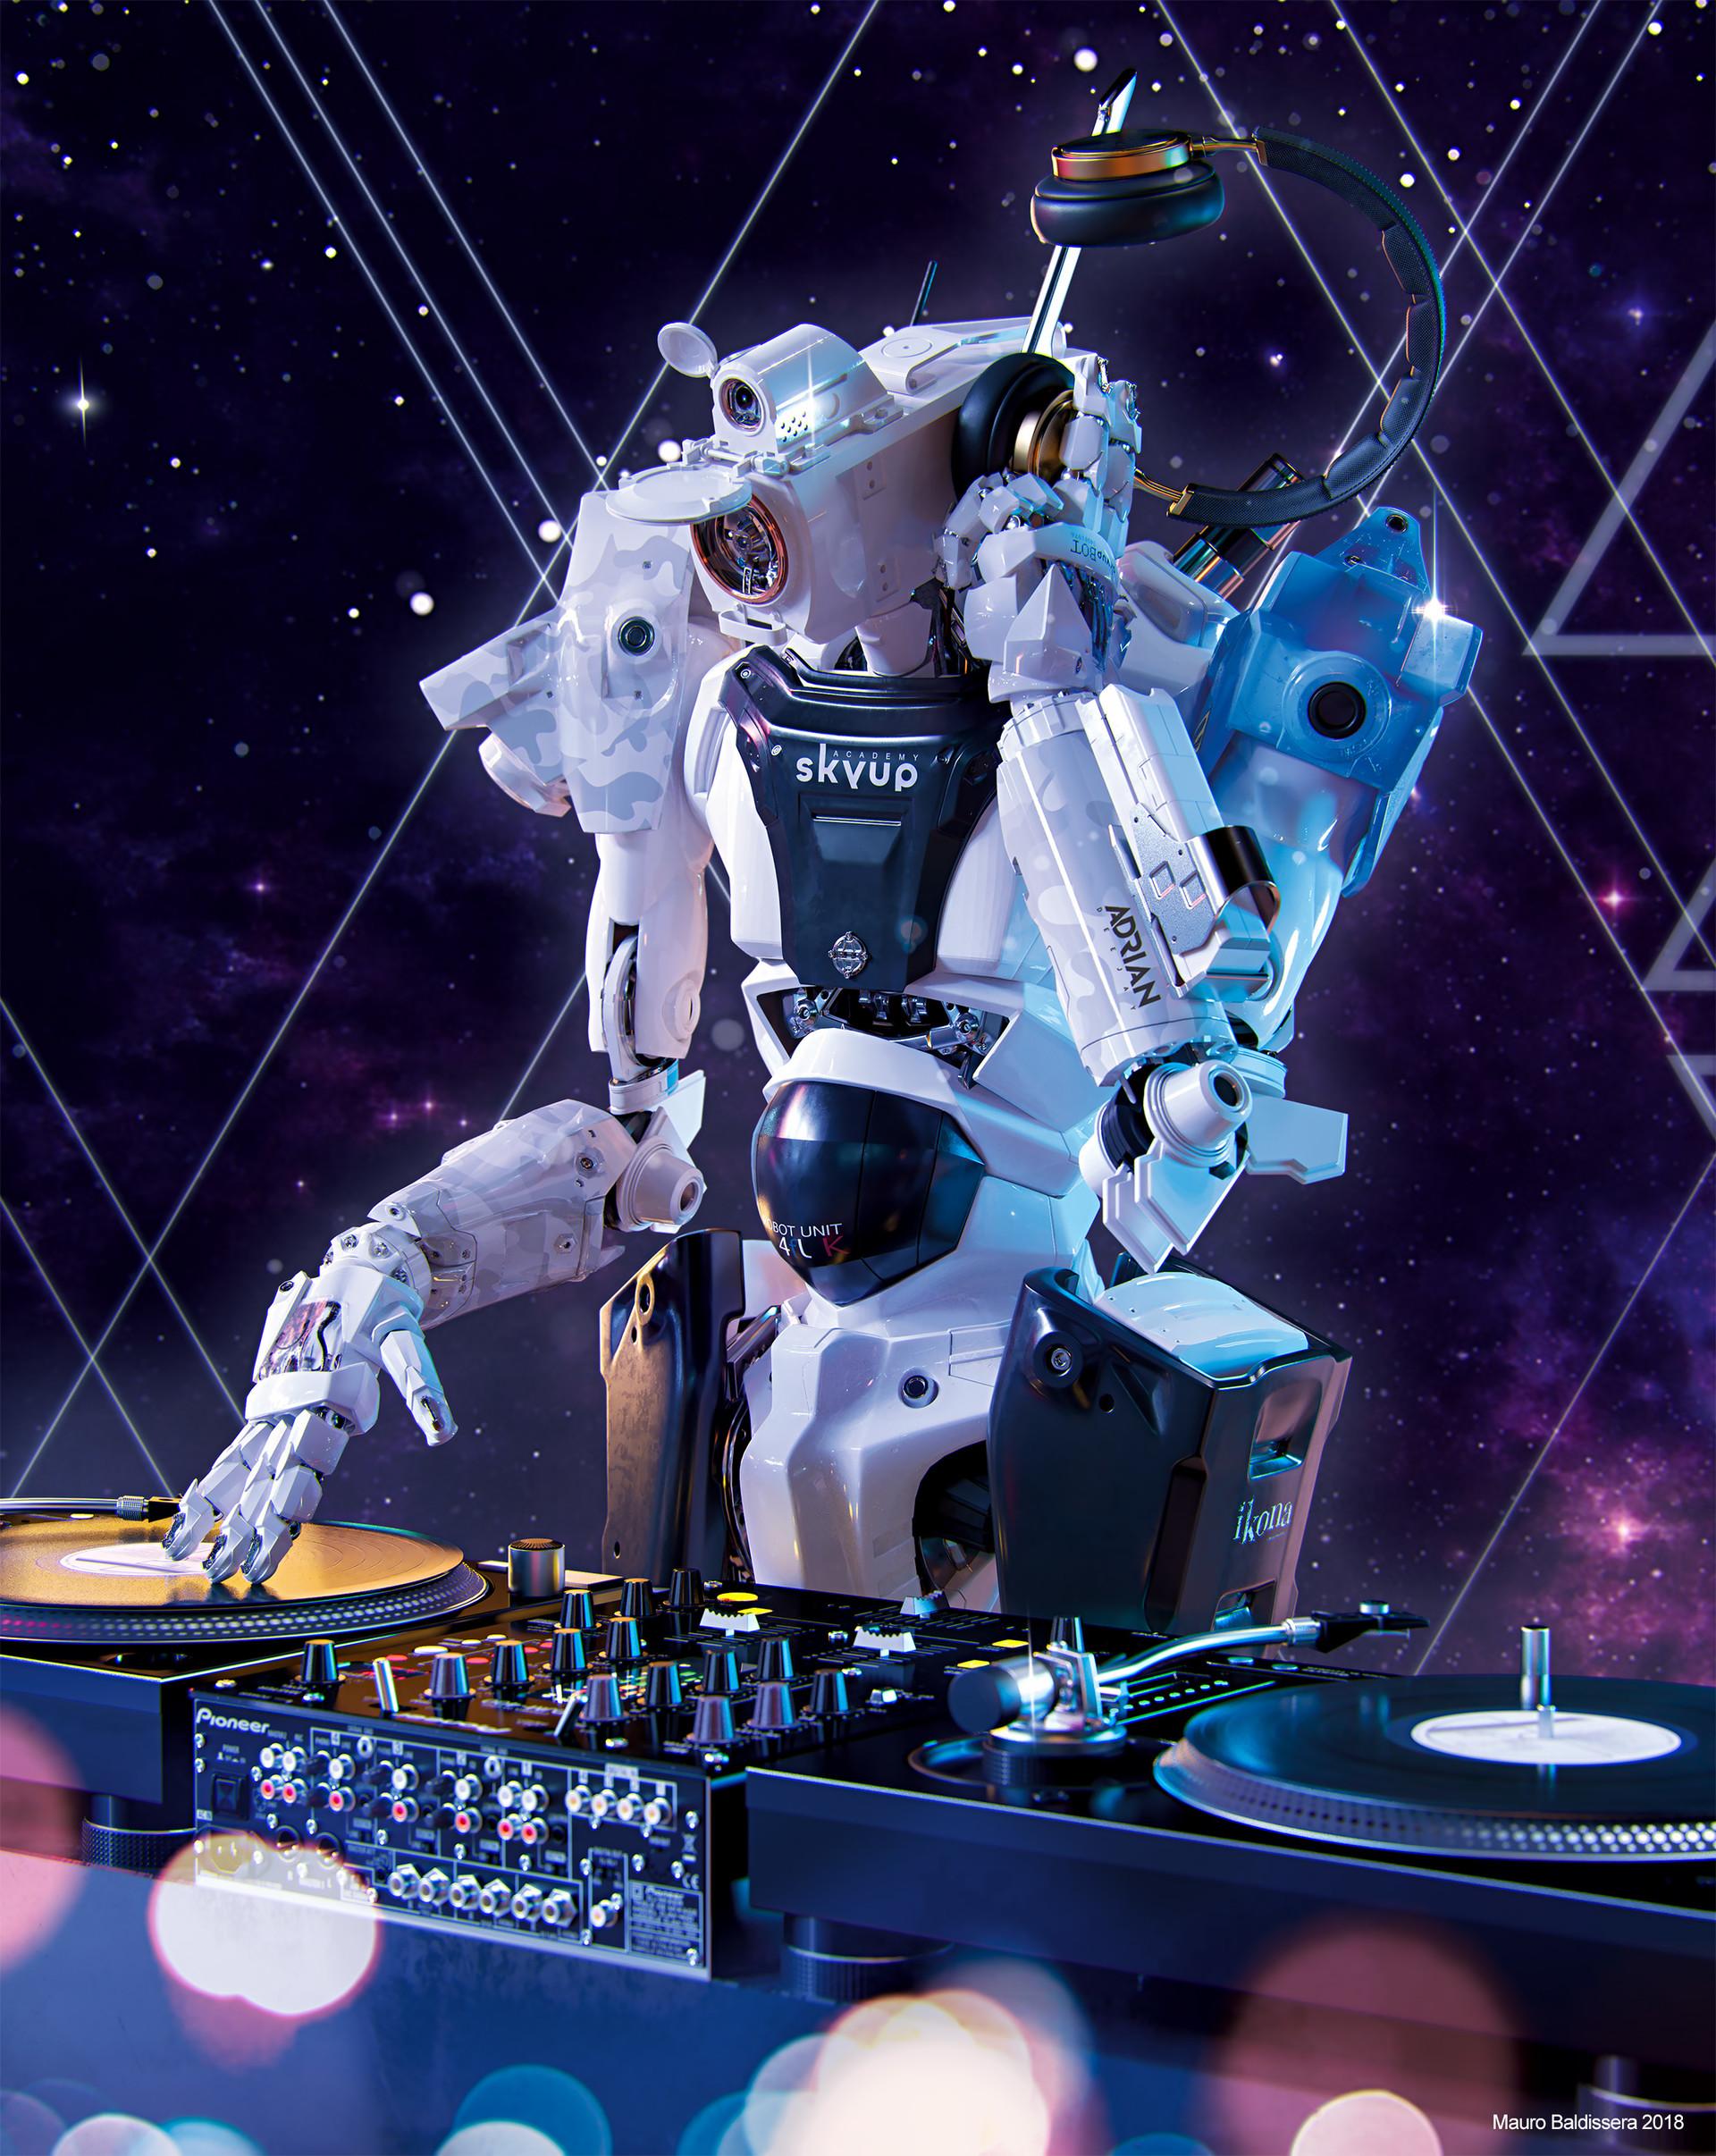 Mauro baldissera skyup academy robot deejay